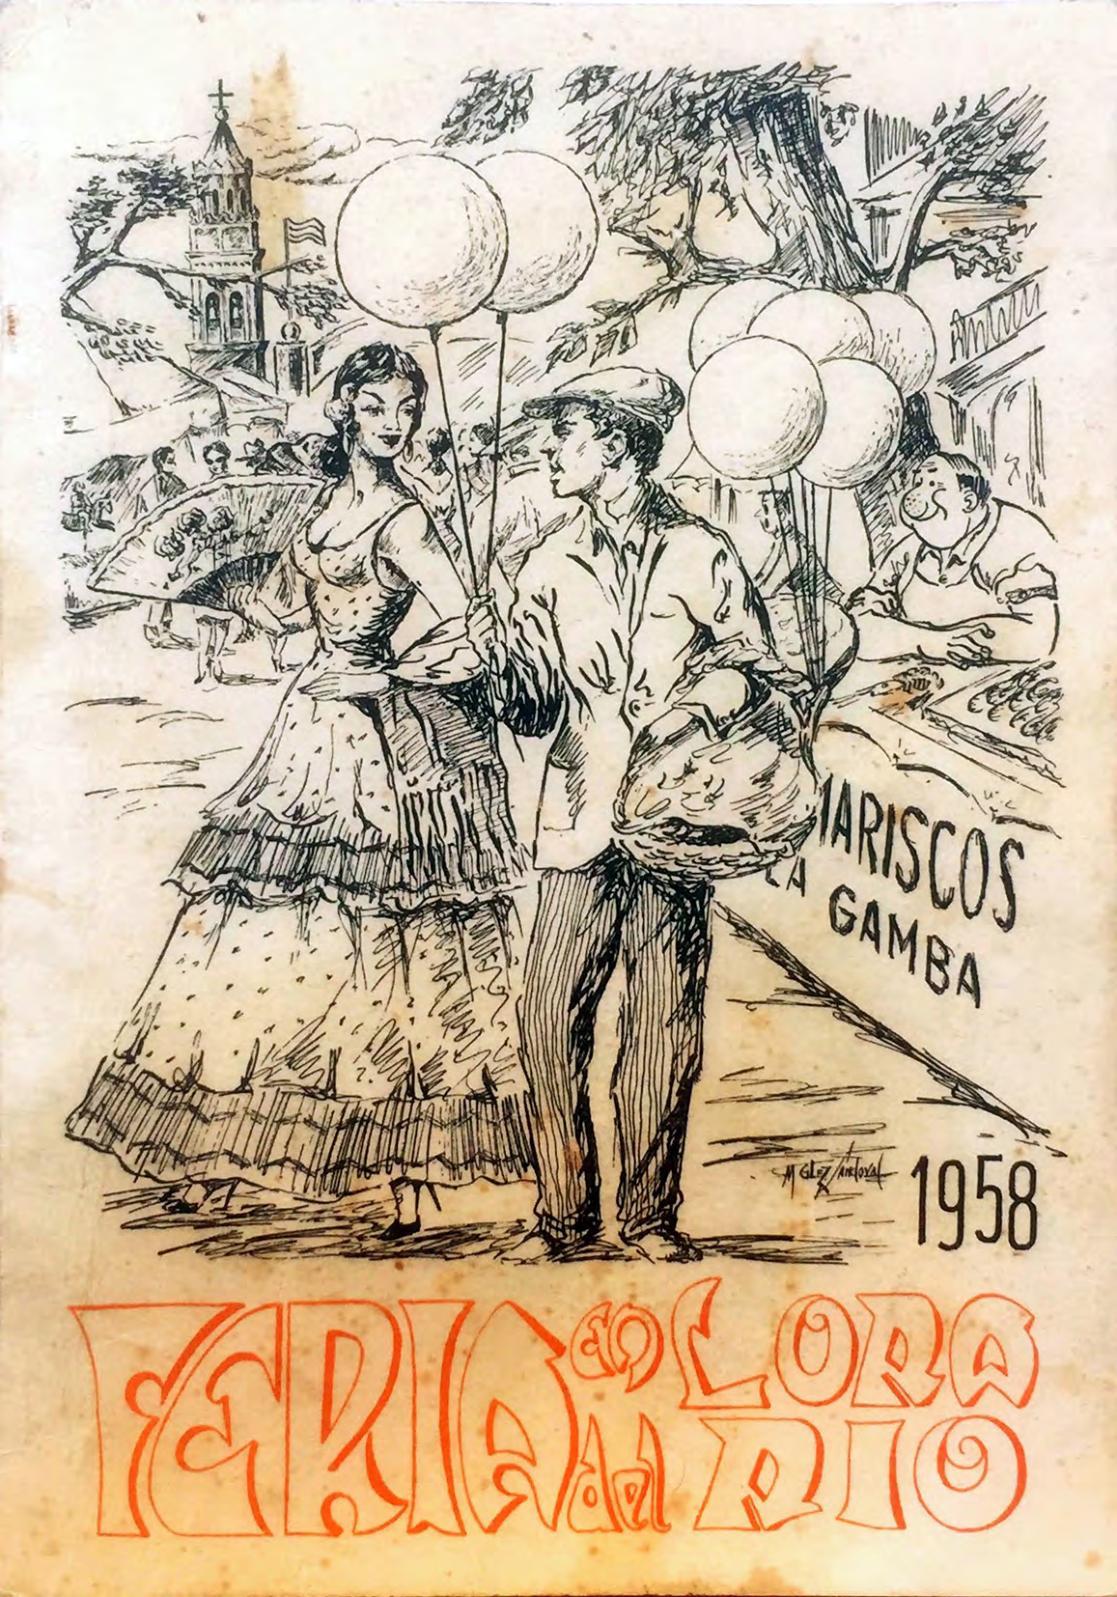 Revista De Feria Lora Del Rio 1958